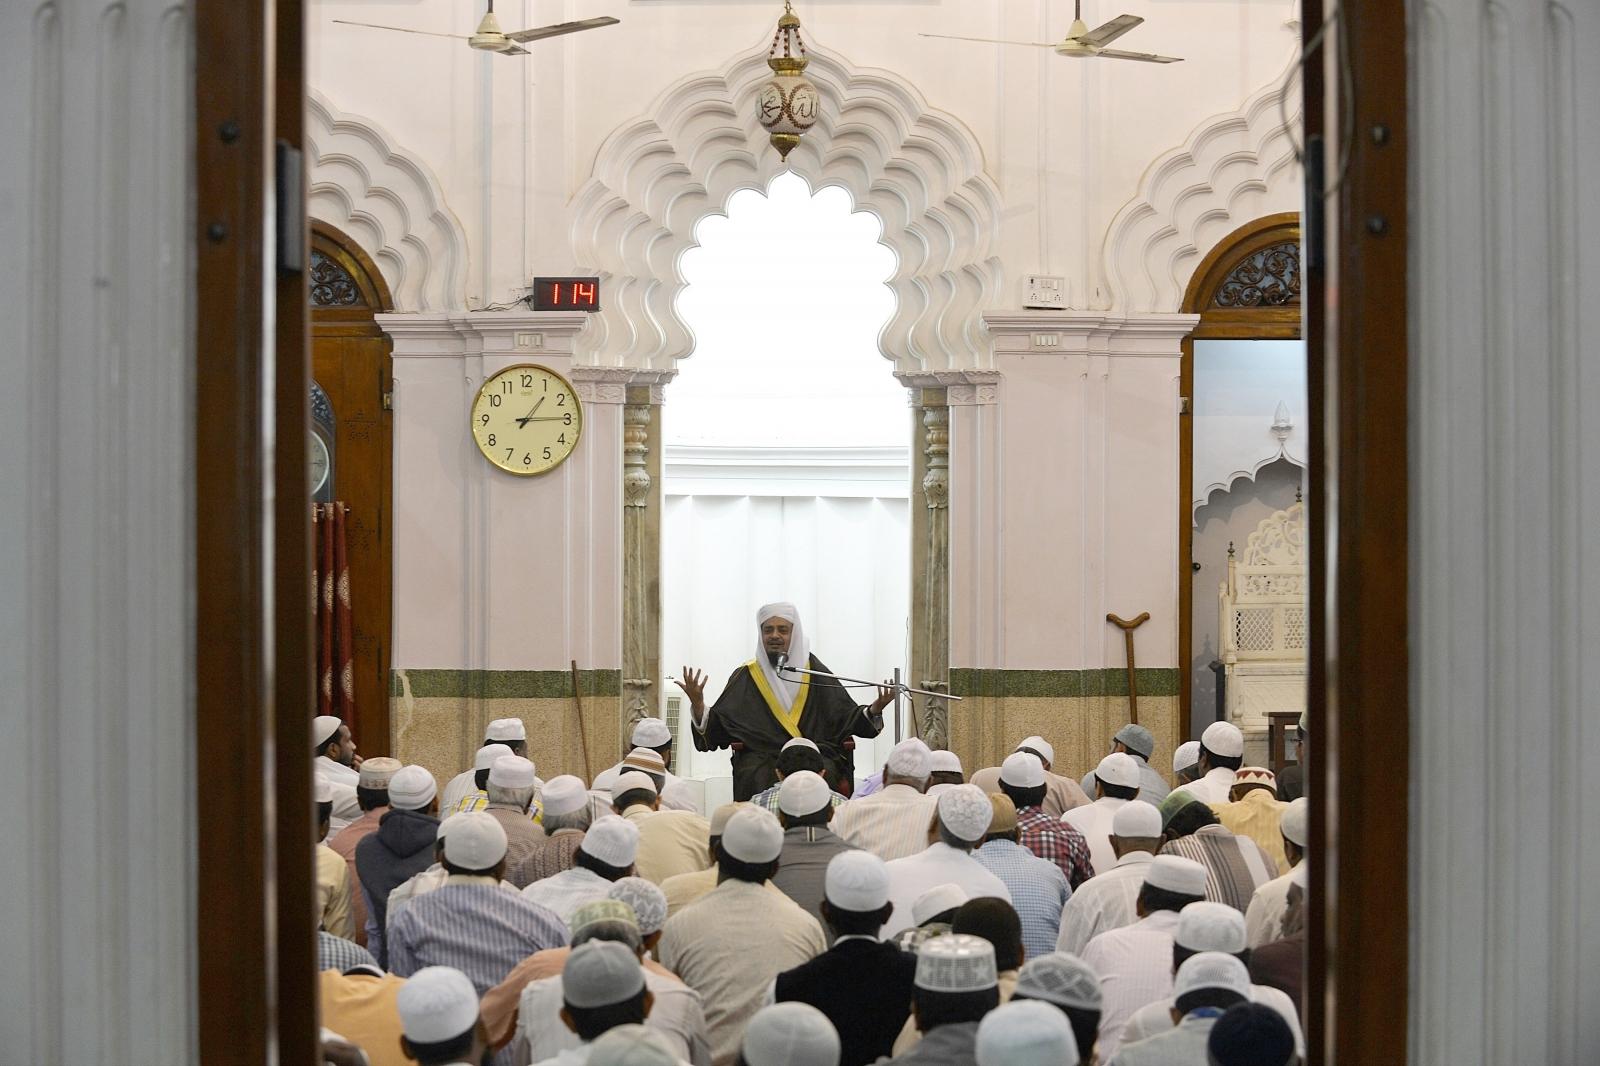 Indian Muslim cleric